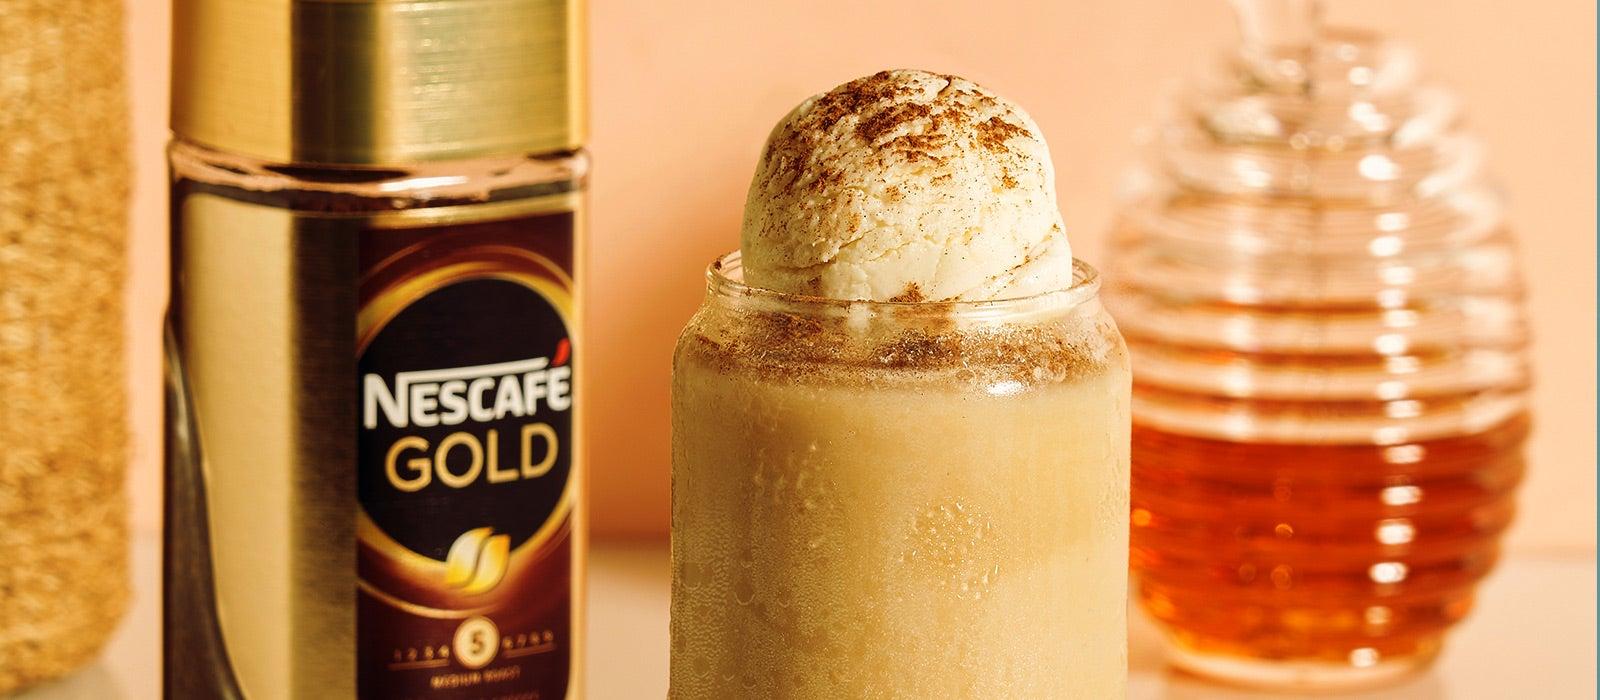 nescafe-gold-iced-cinnamon-honey-recipe-banner_0.jpg